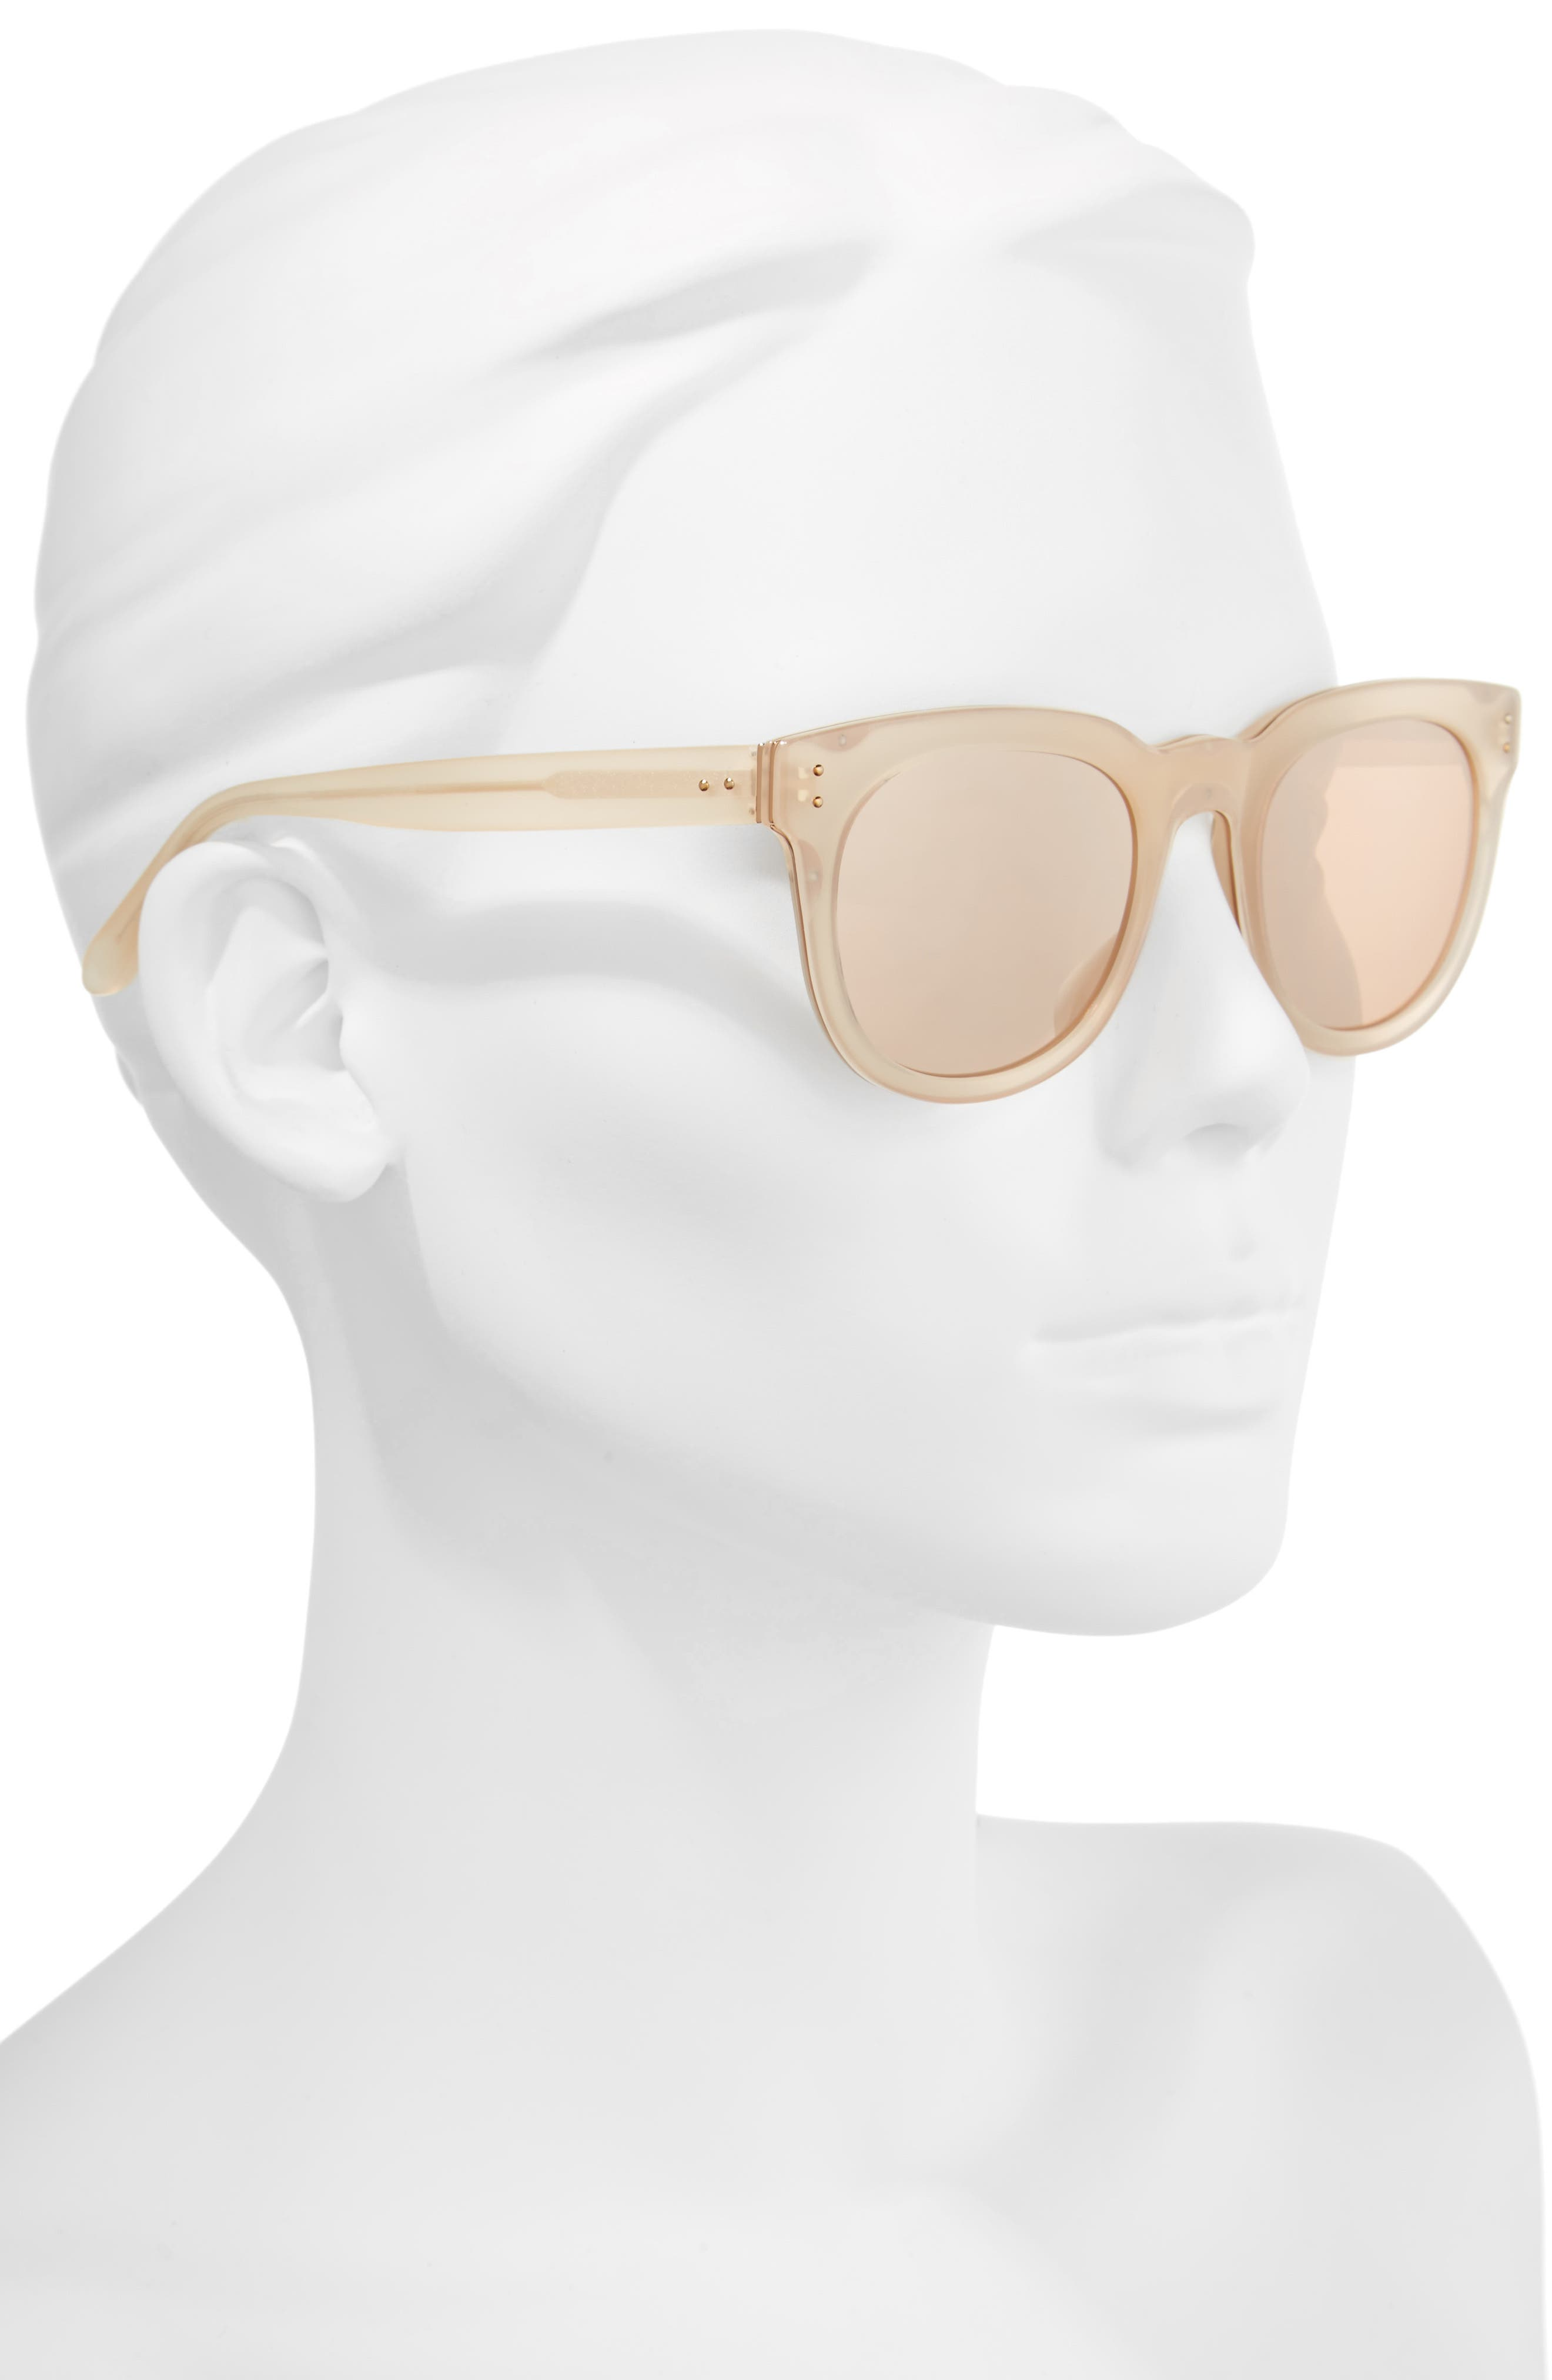 50mm D-Frame Mirrored Sunglasses,                             Alternate thumbnail 2, color,                             950